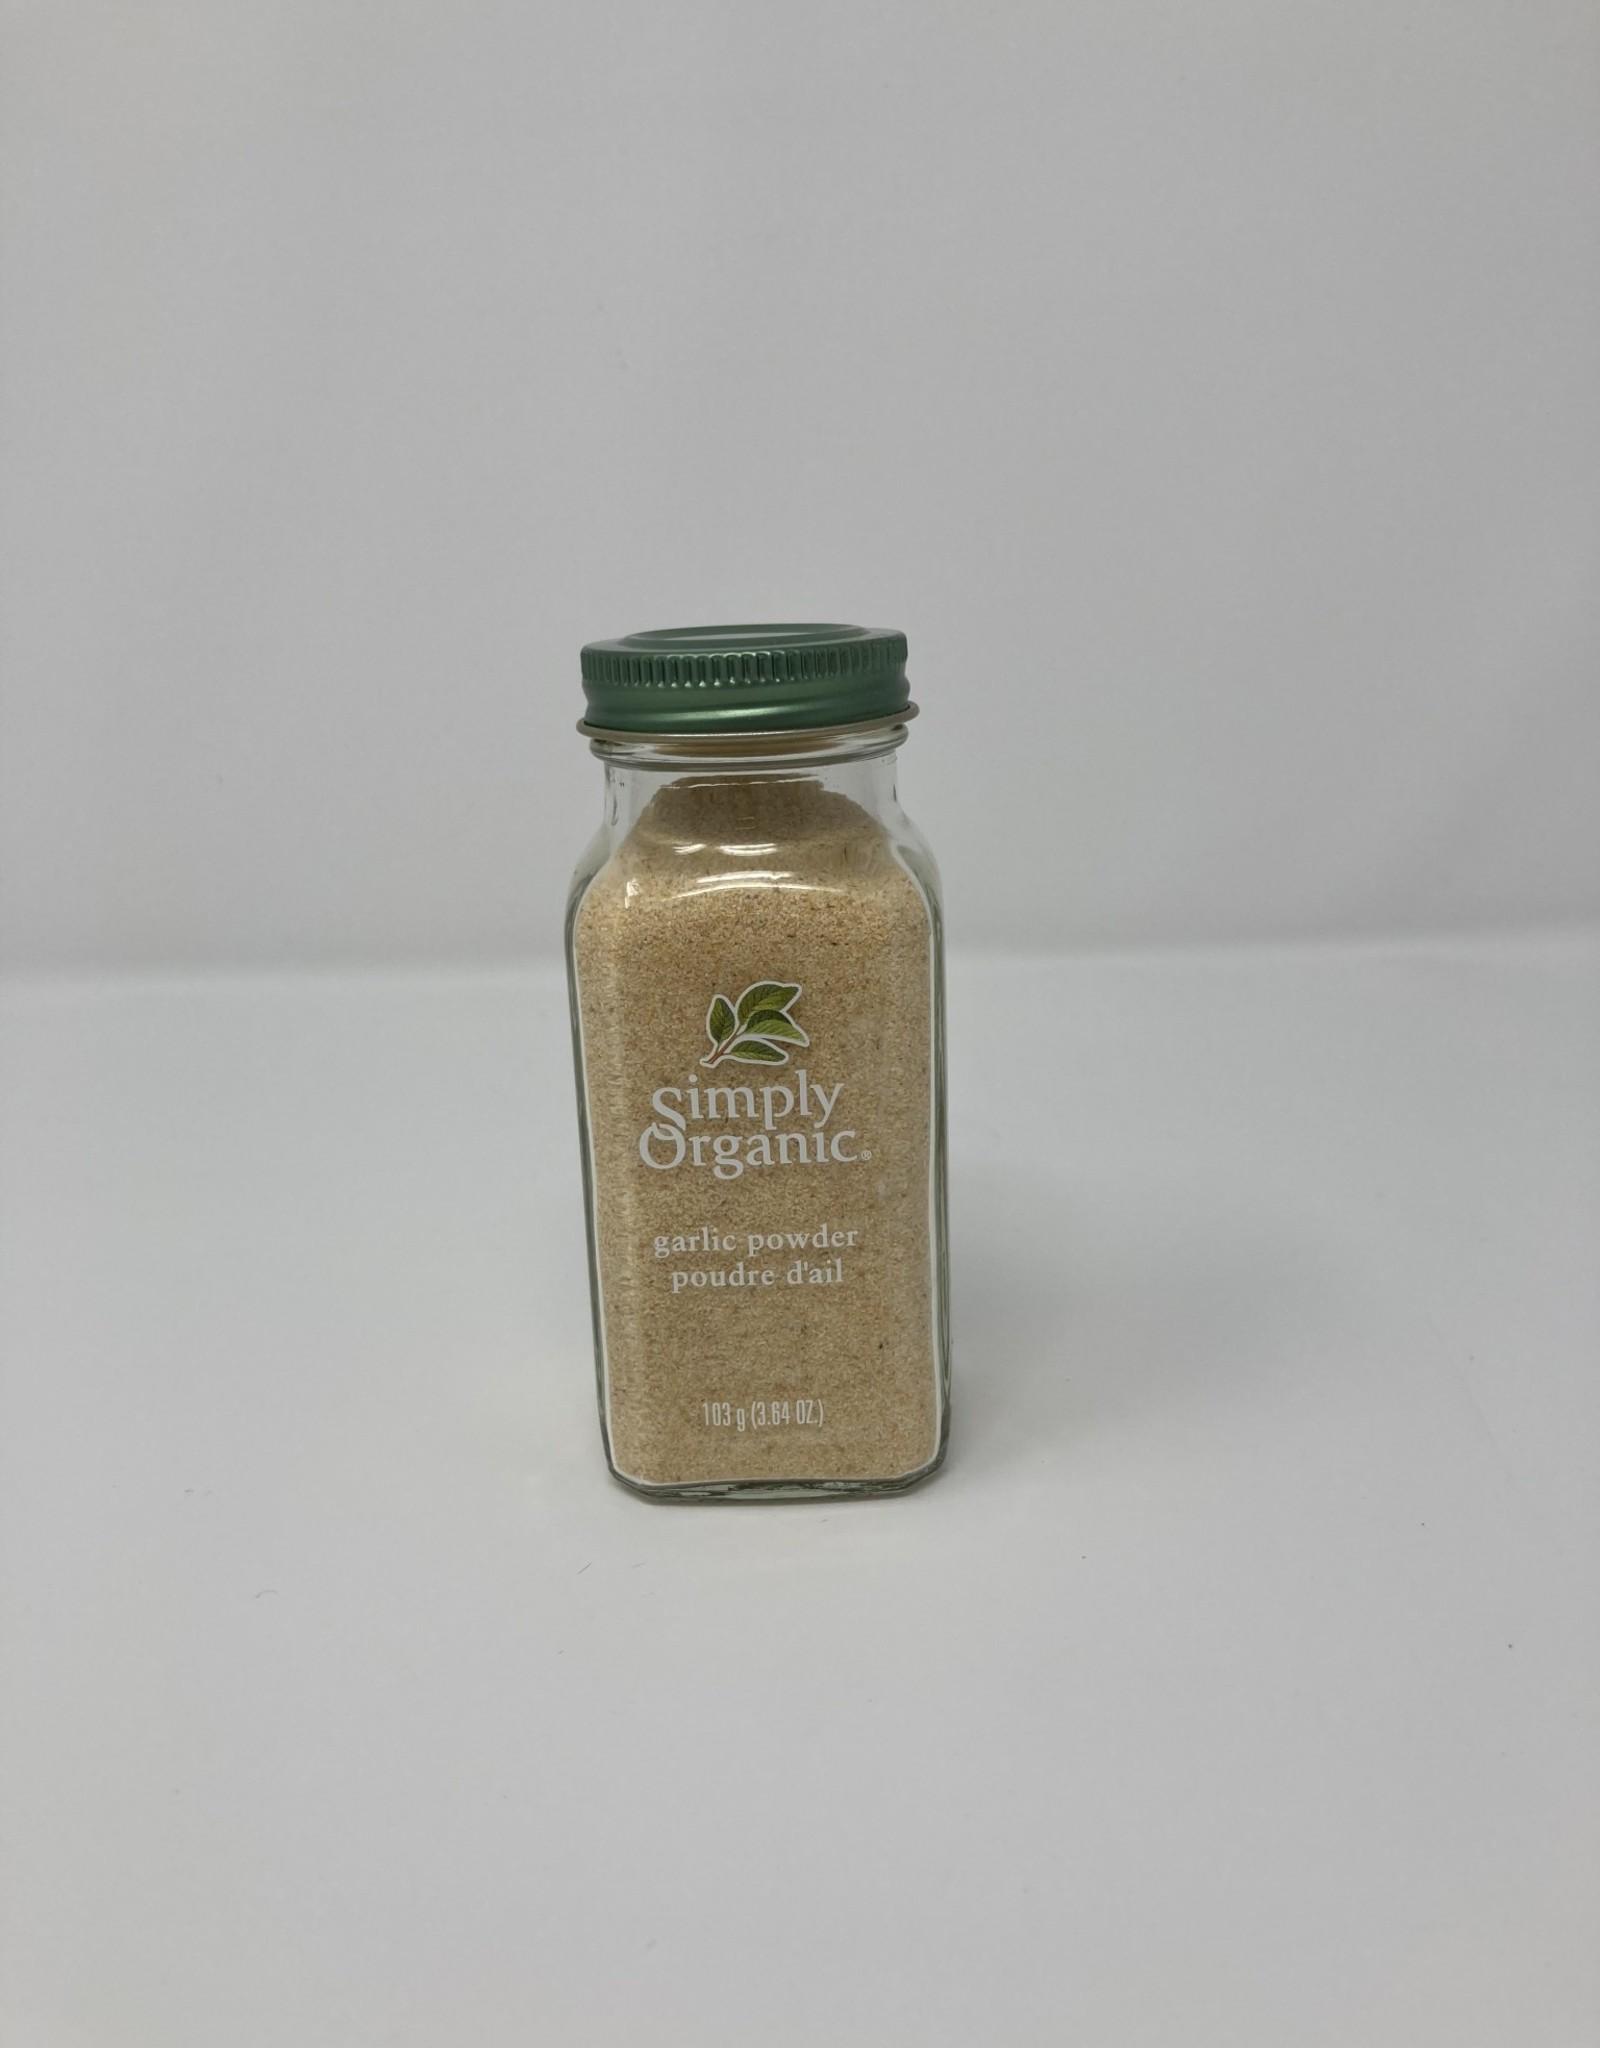 Simply Organic Simply Organic - Garlic Powder, Organic